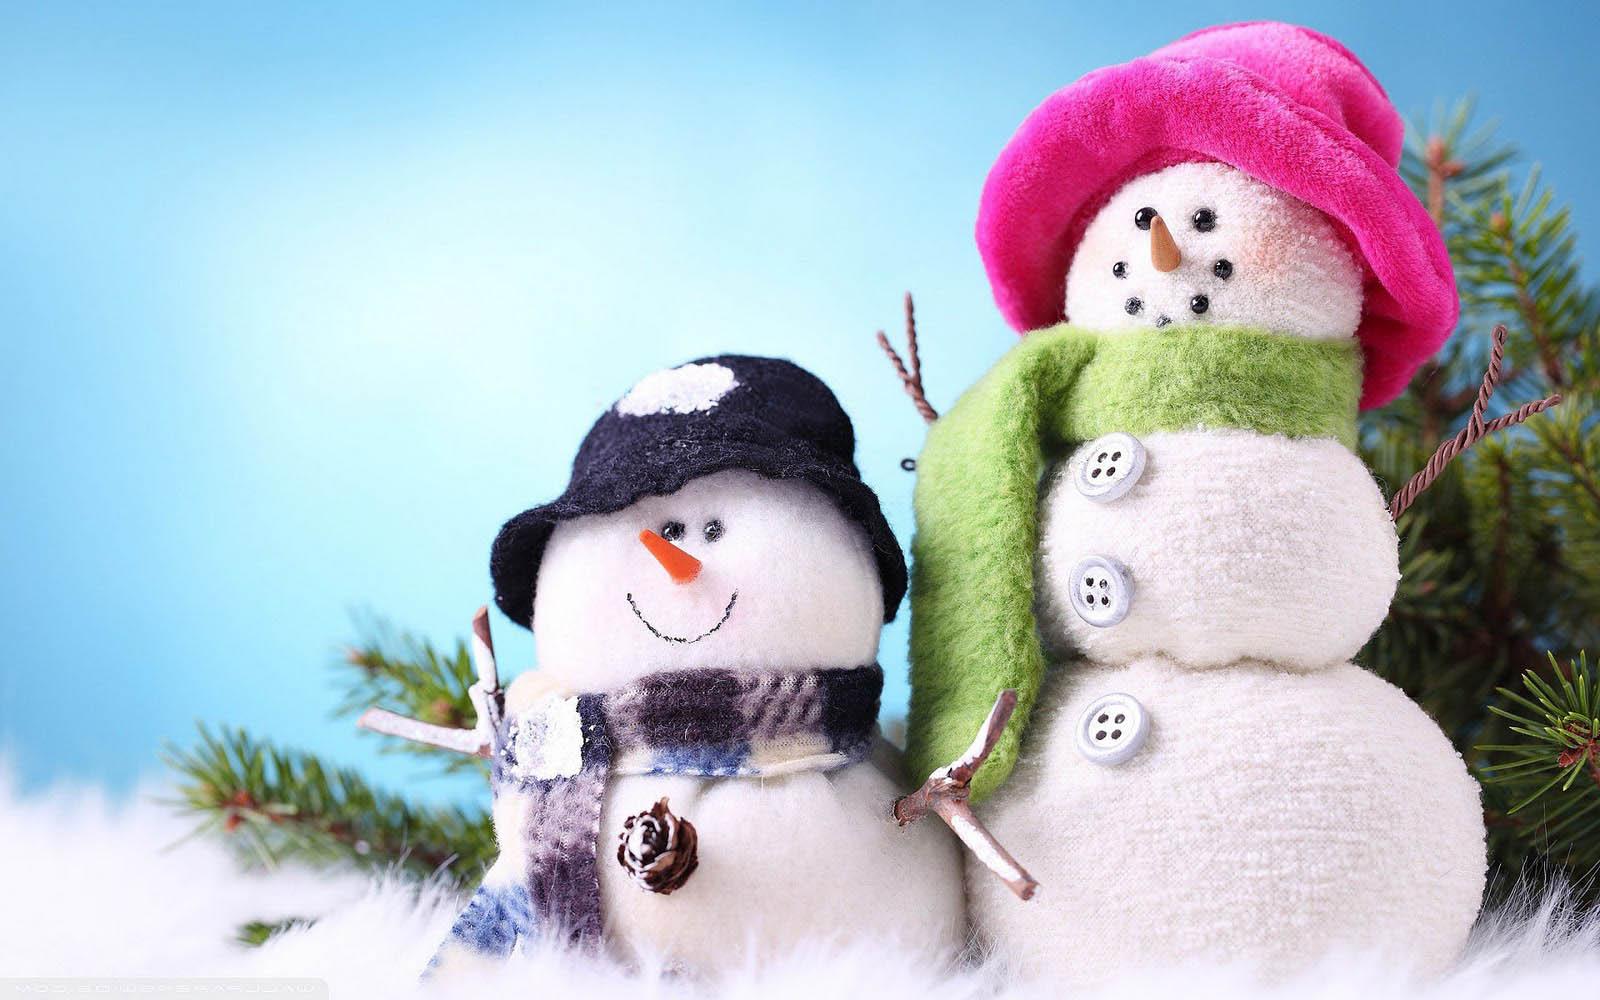 snowman desktop background - photo #25